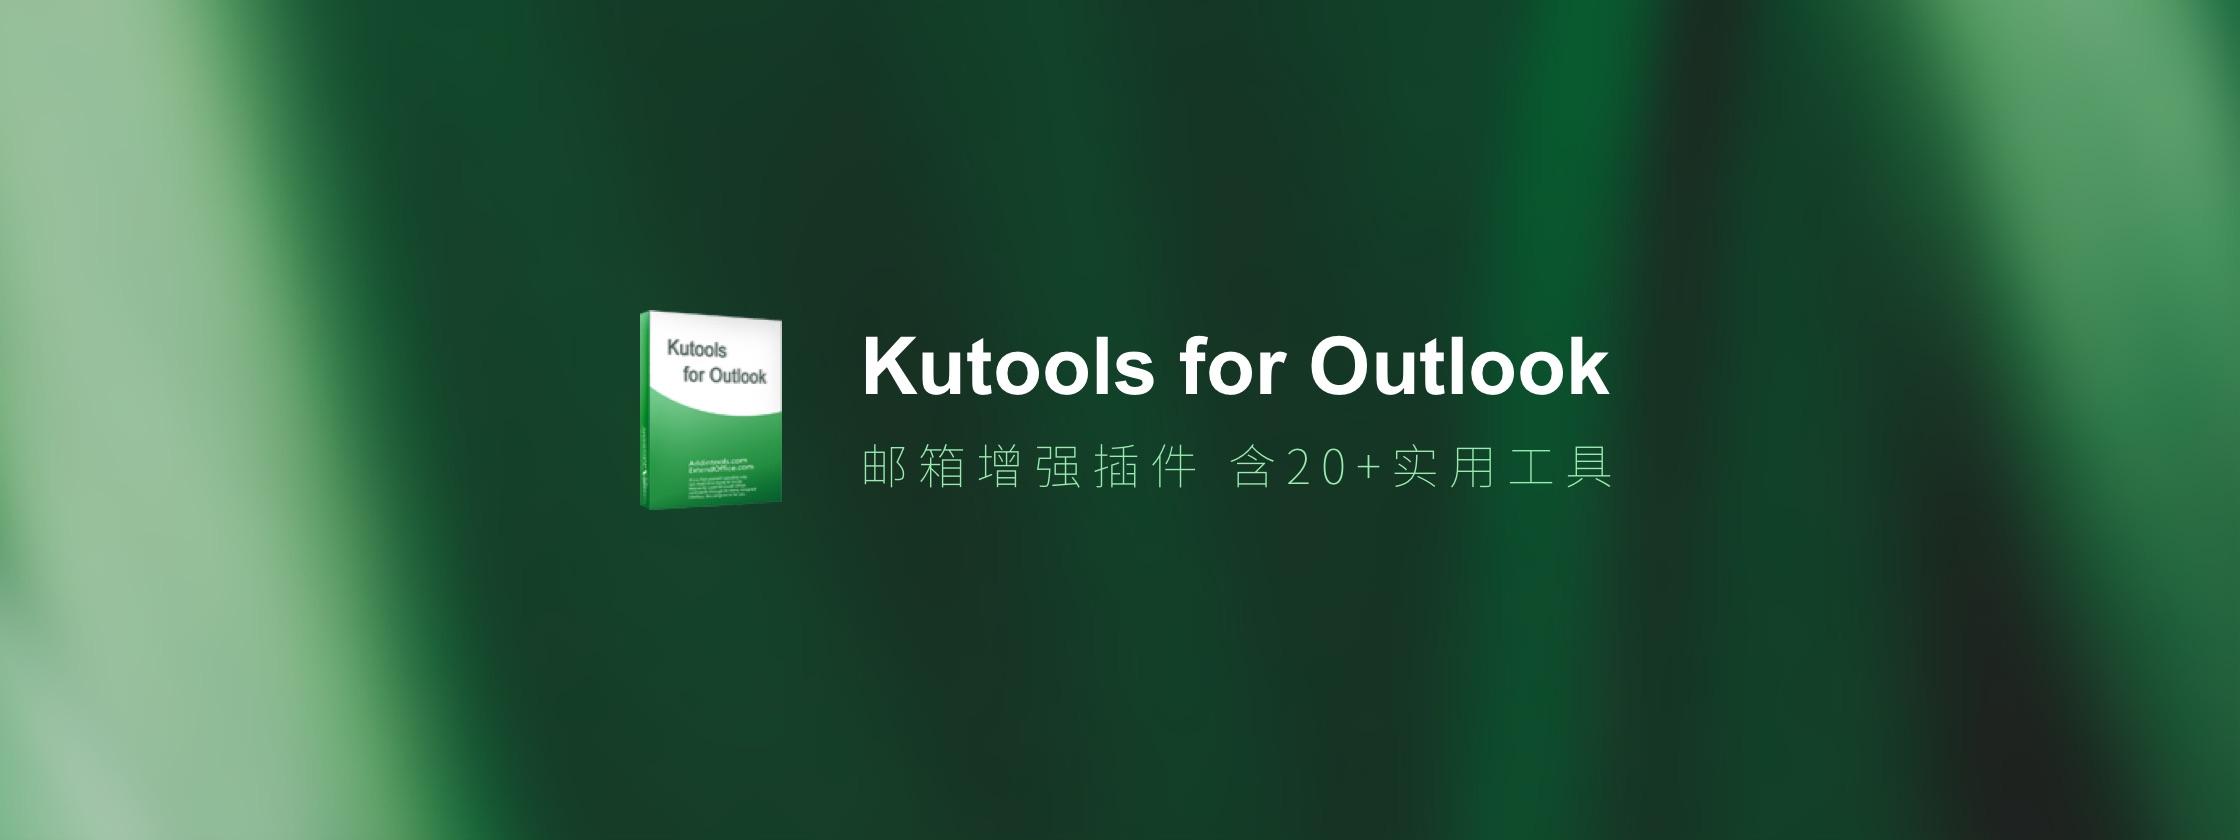 Kutools for Outlook,邮箱增强插件,含 20+ 实用工具